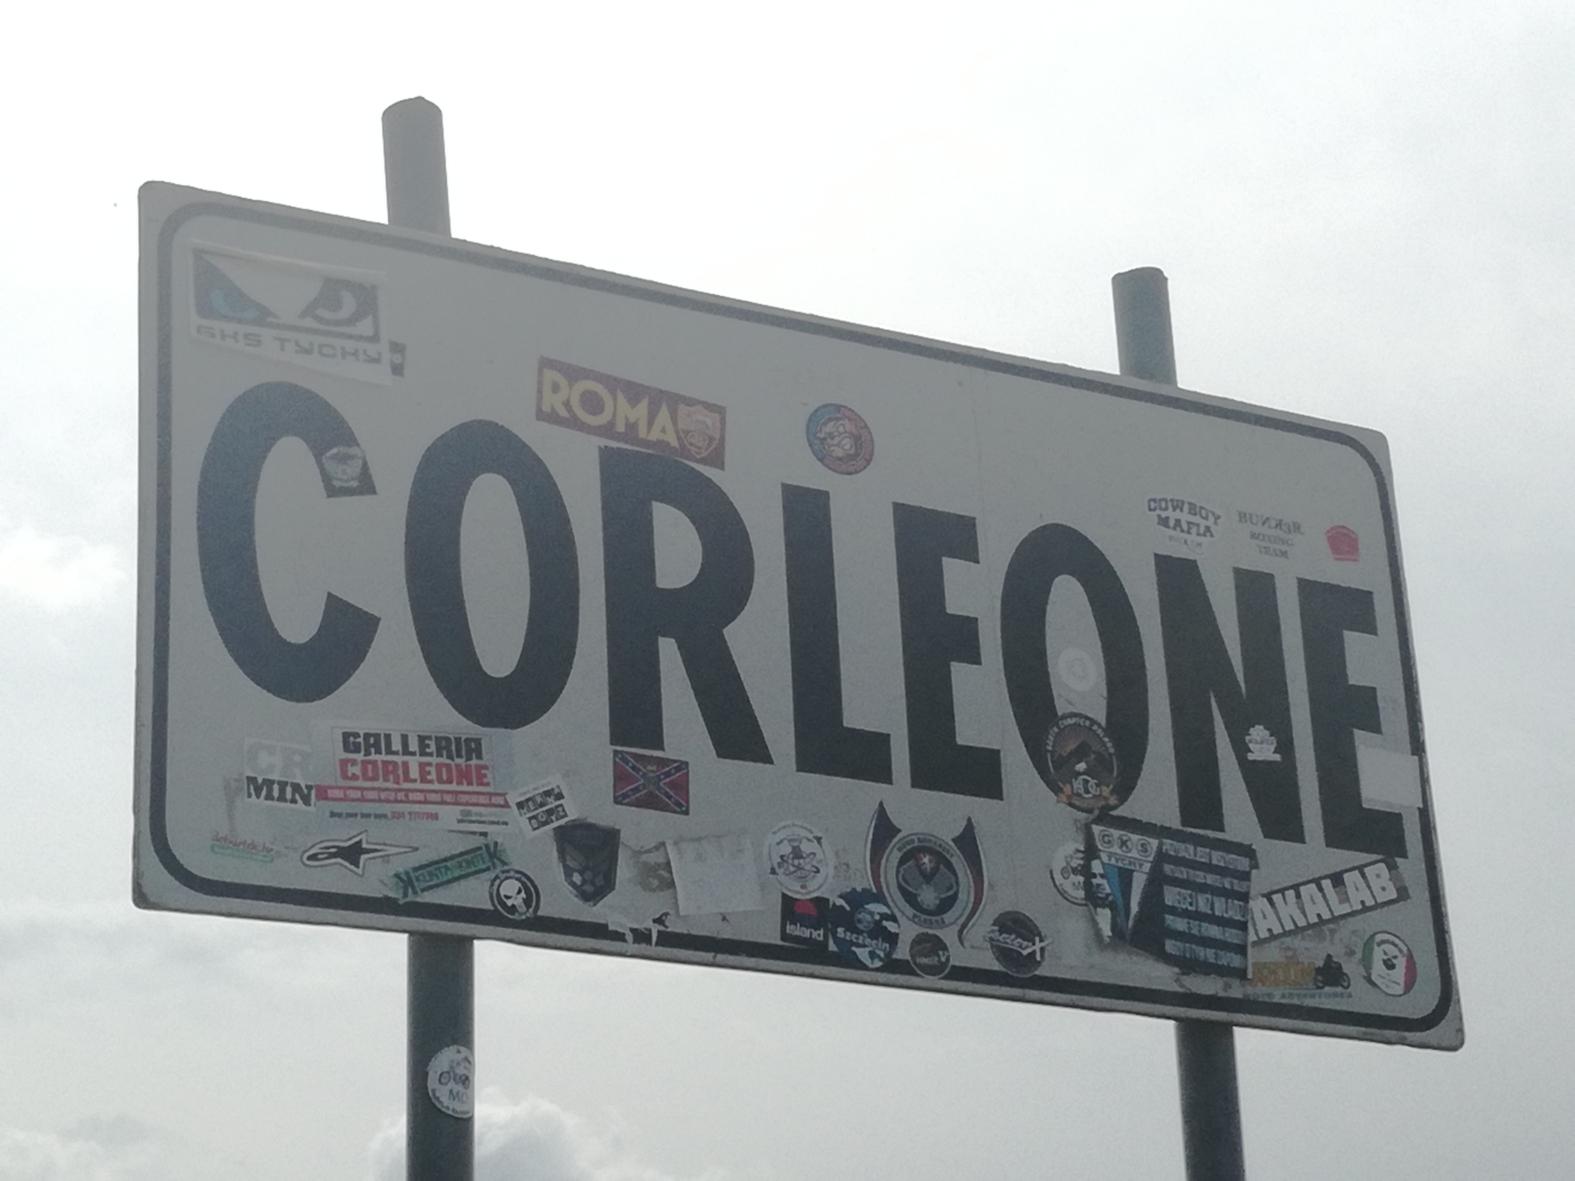 Ortsschild Corleone